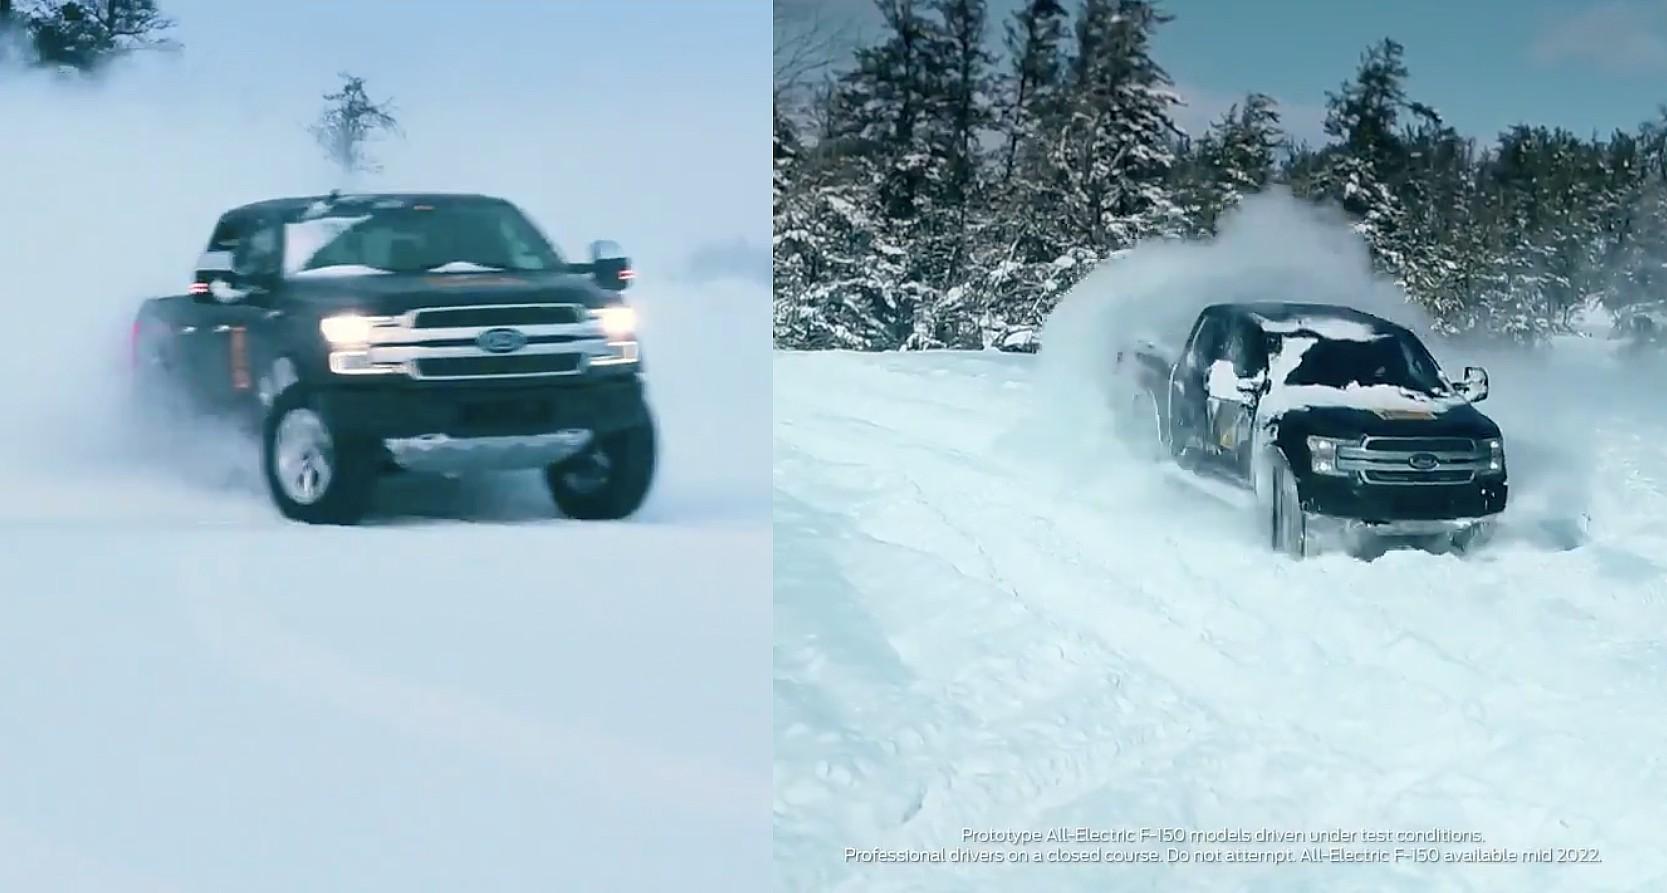 ford-f-150-ev-snow